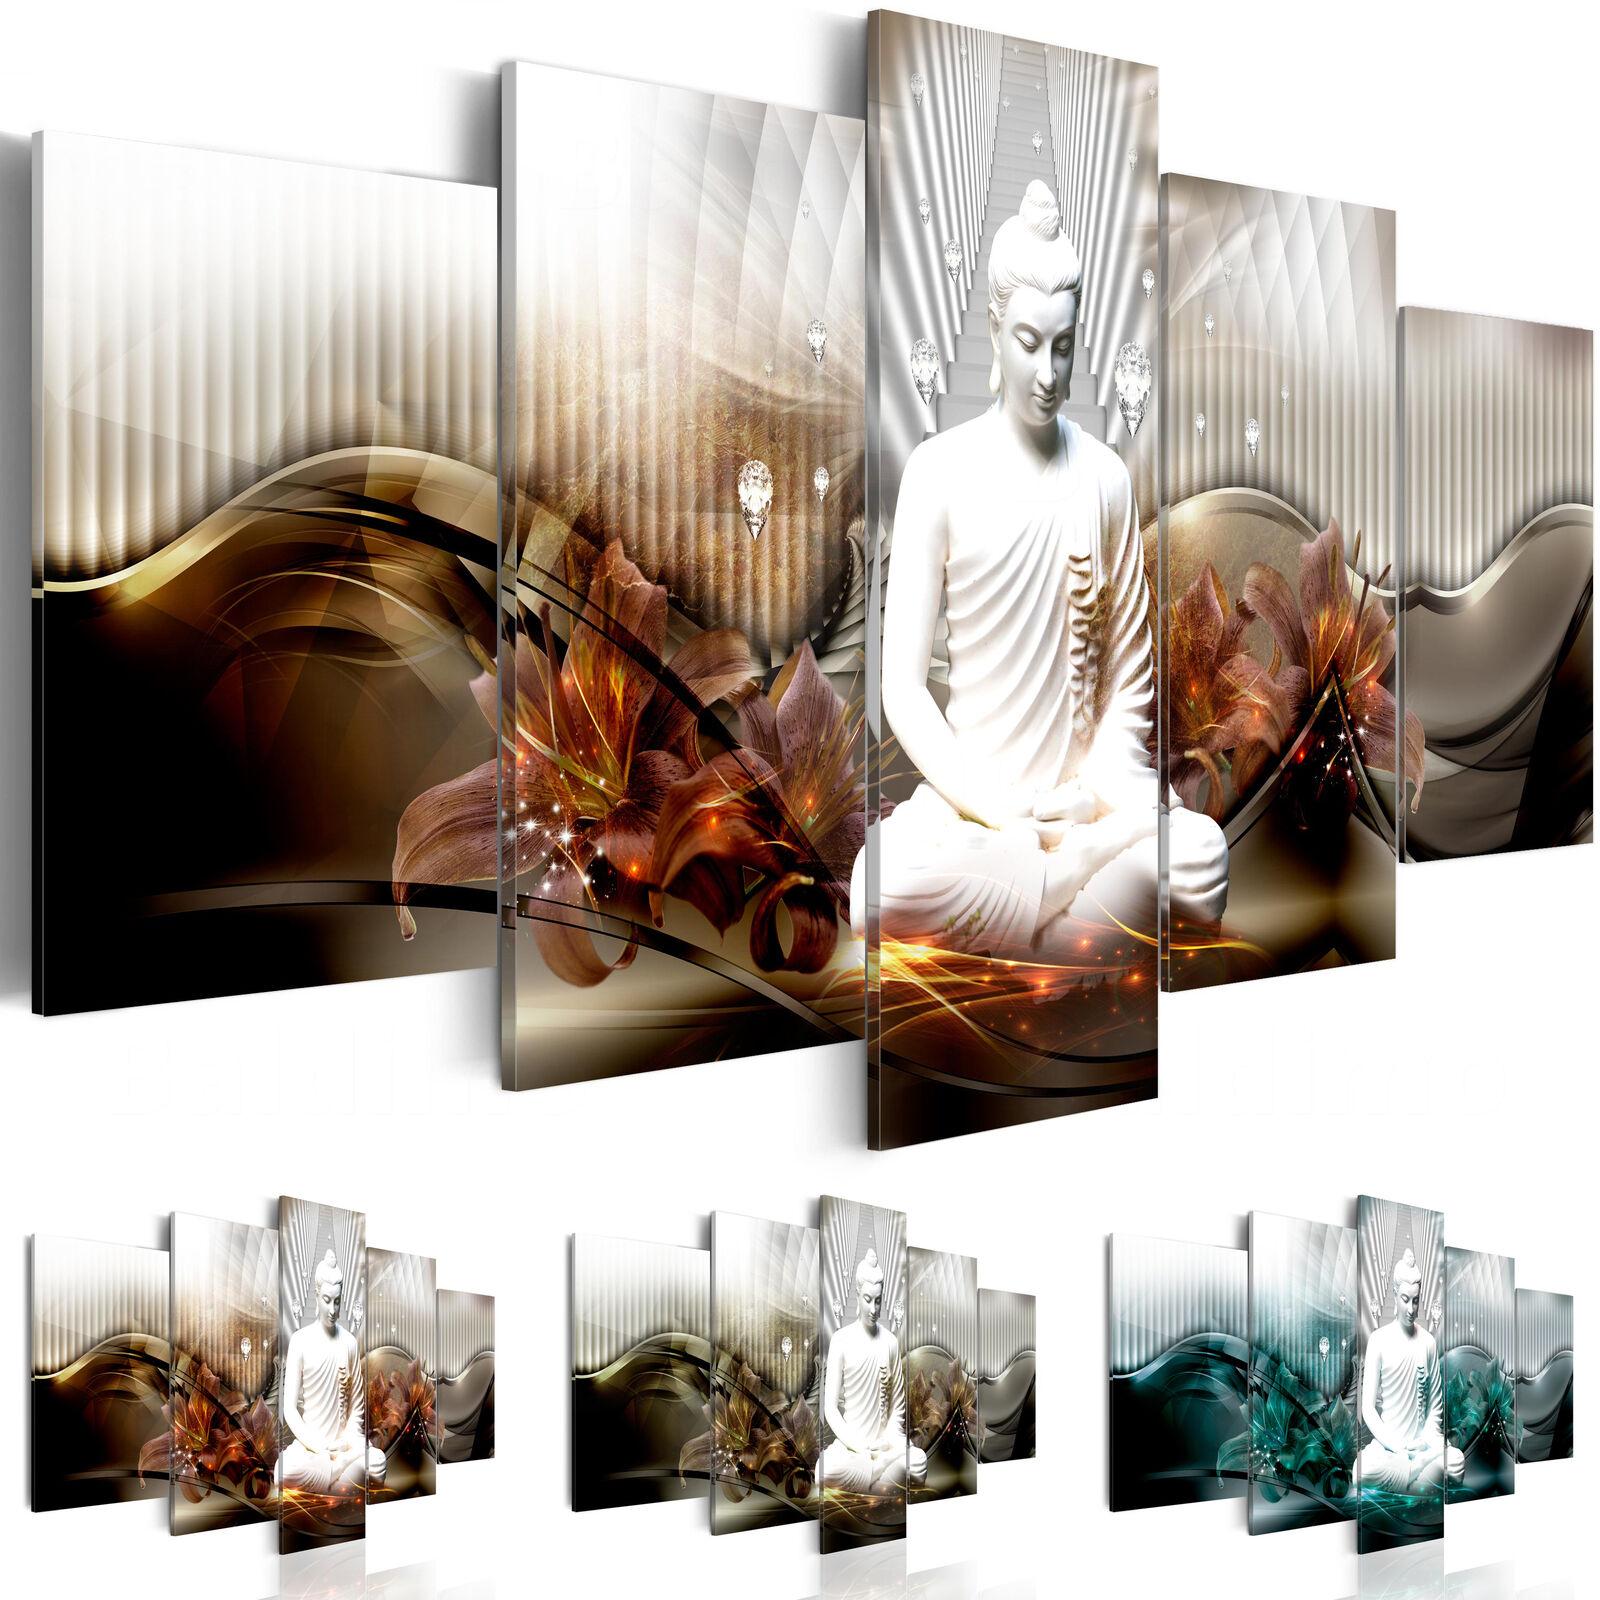 Cuadros lienzo XXL decoracion parot foto impresión Buda Zen Spa h-C-0043-b-n